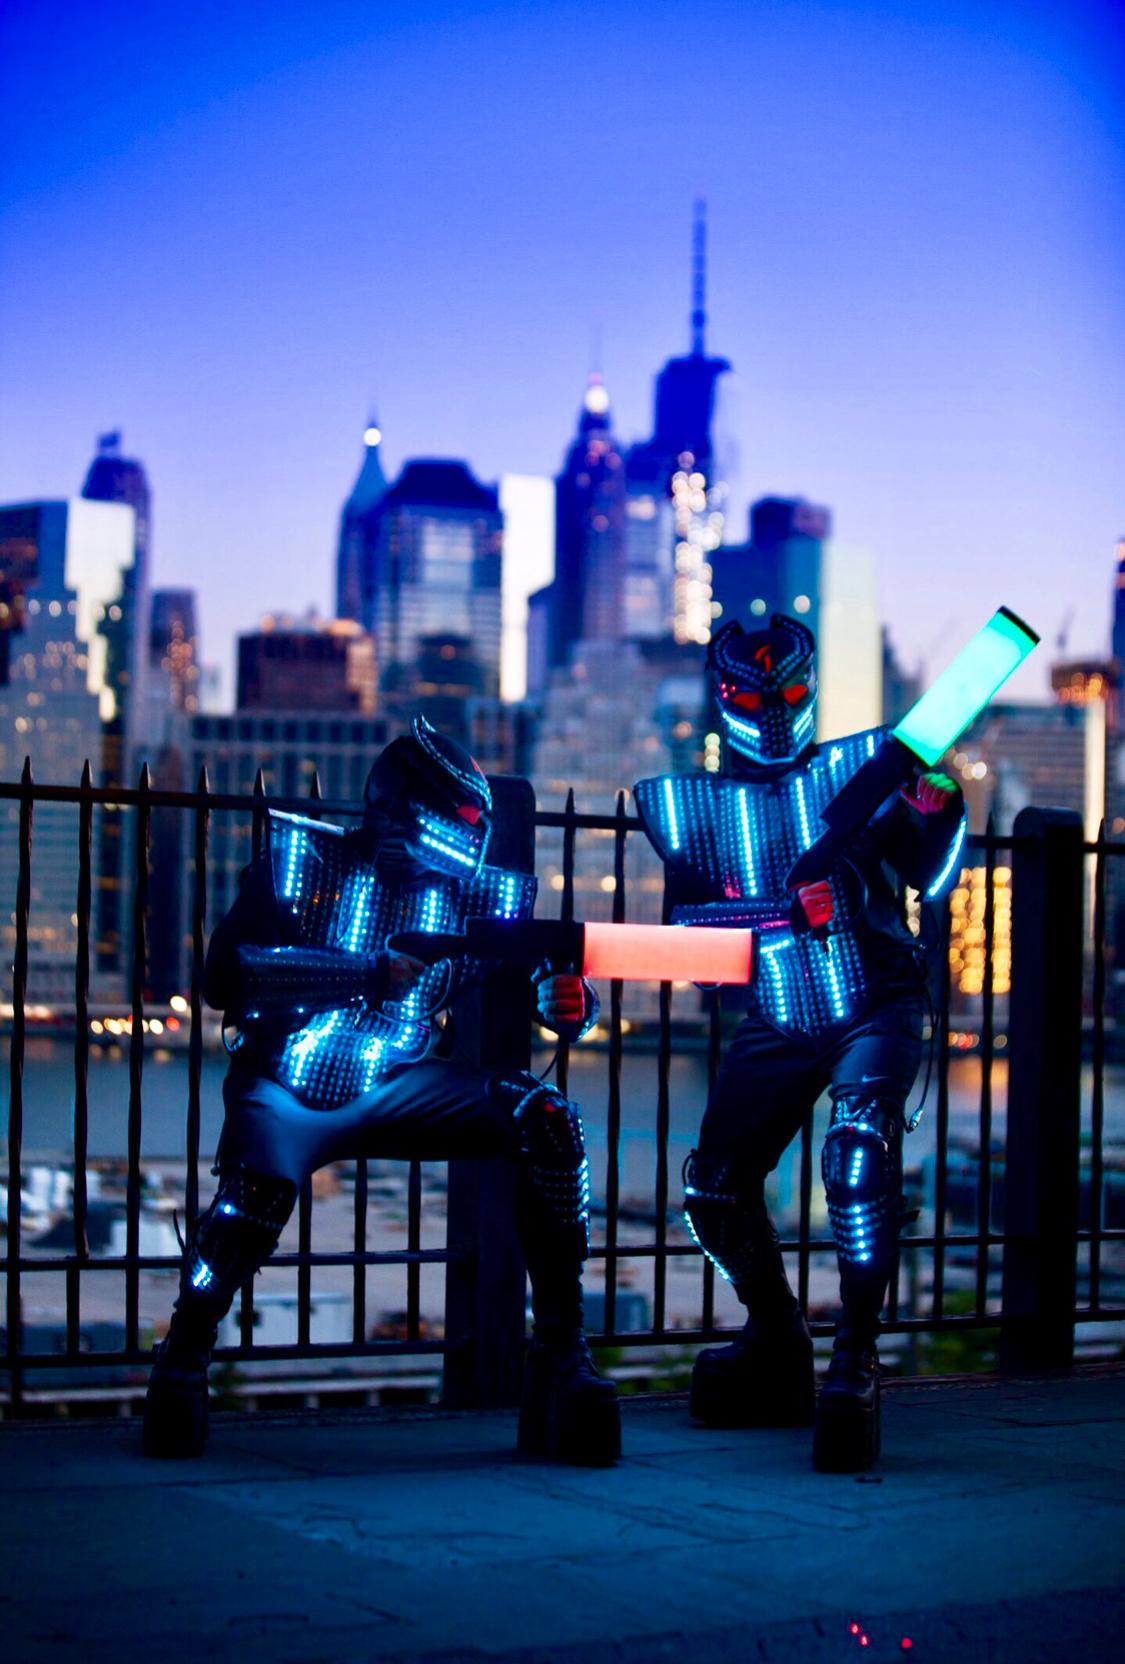 led-robot-new-y.jpg